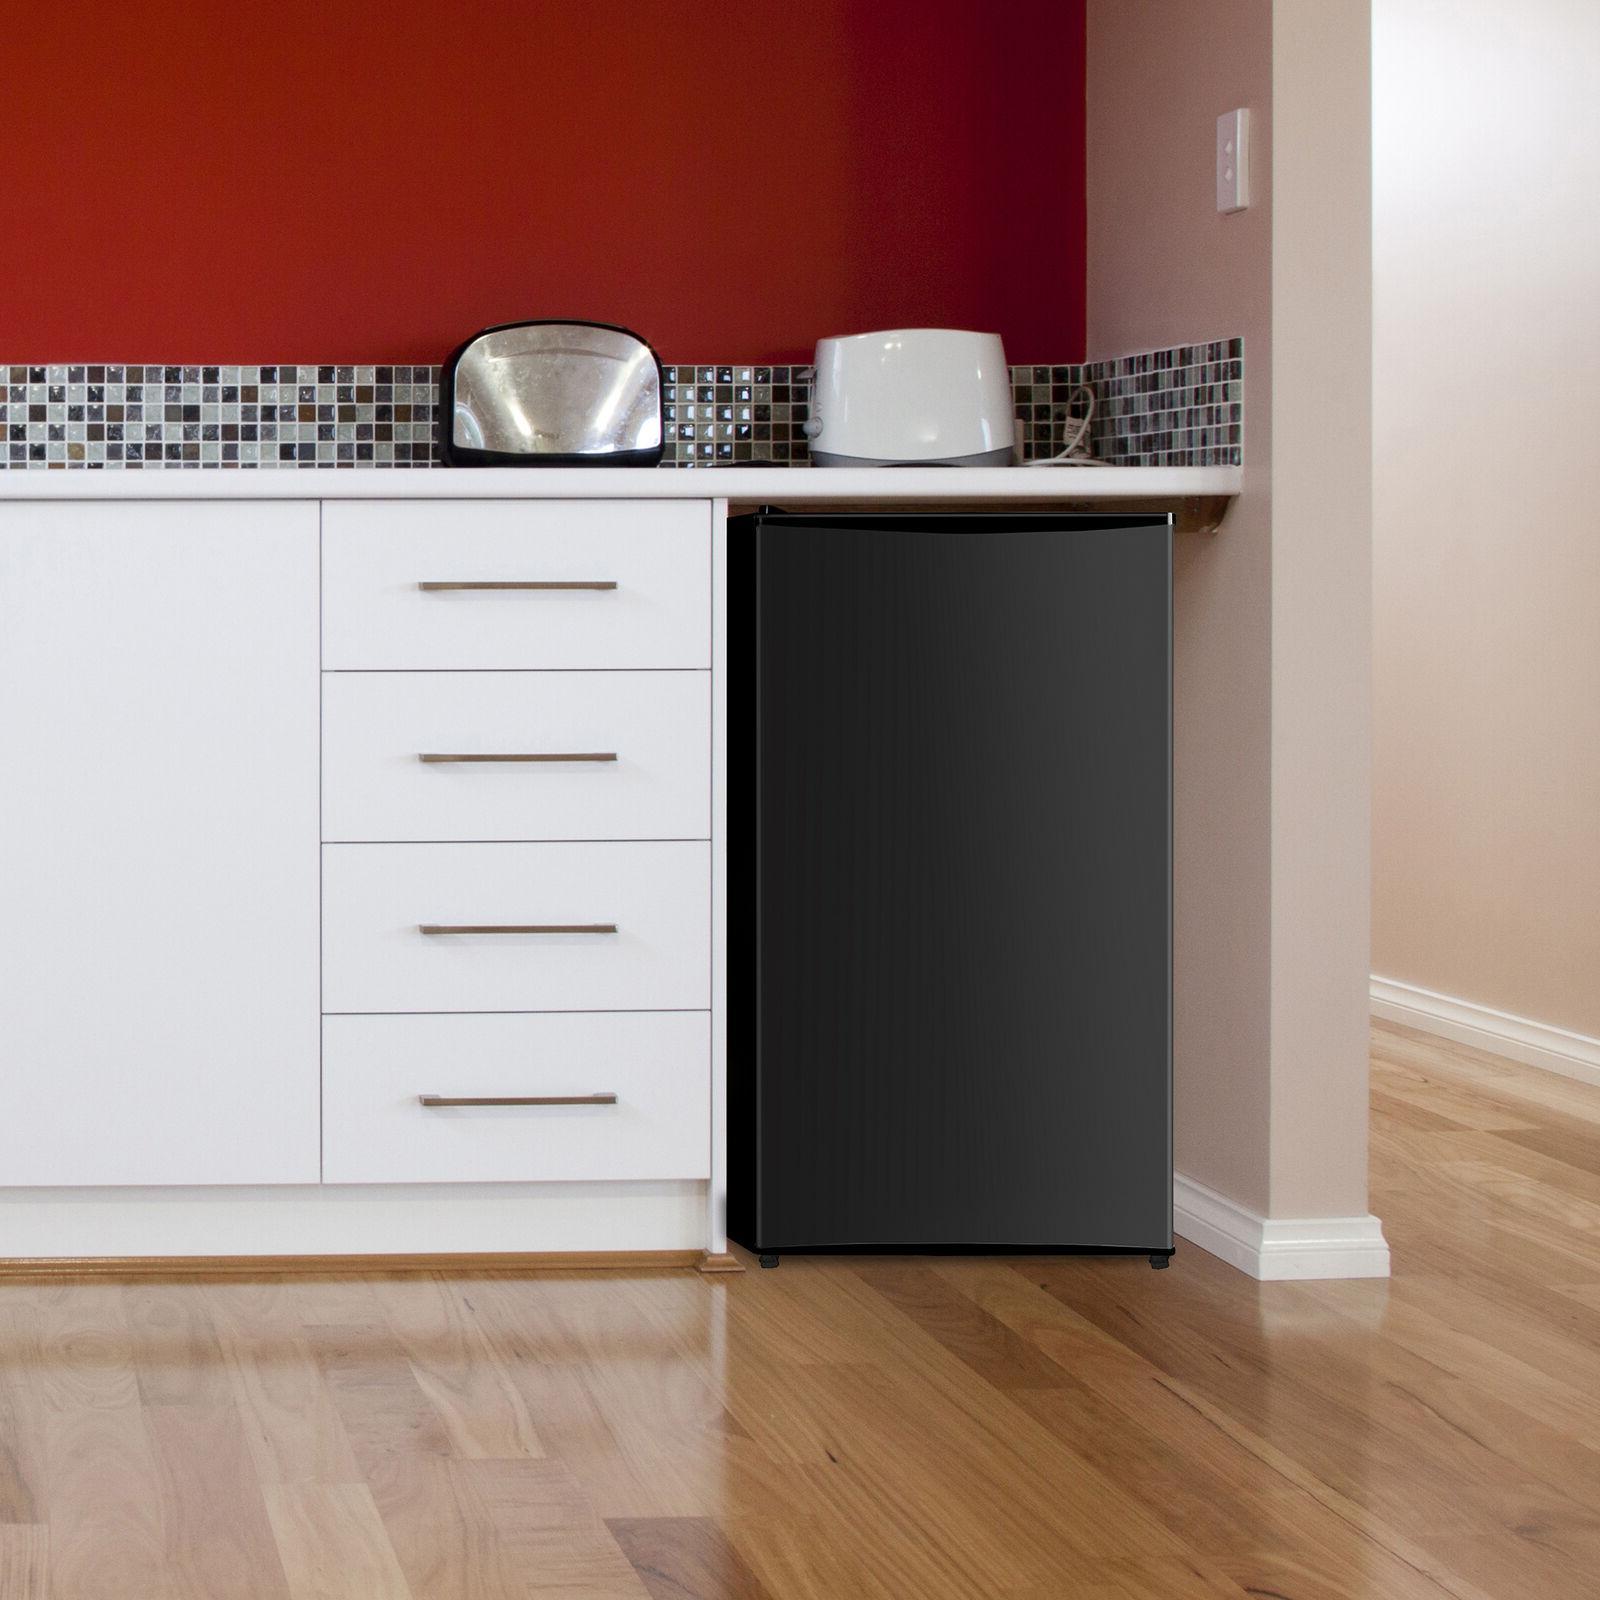 Mini Fridge Food Refrigerator Single Door